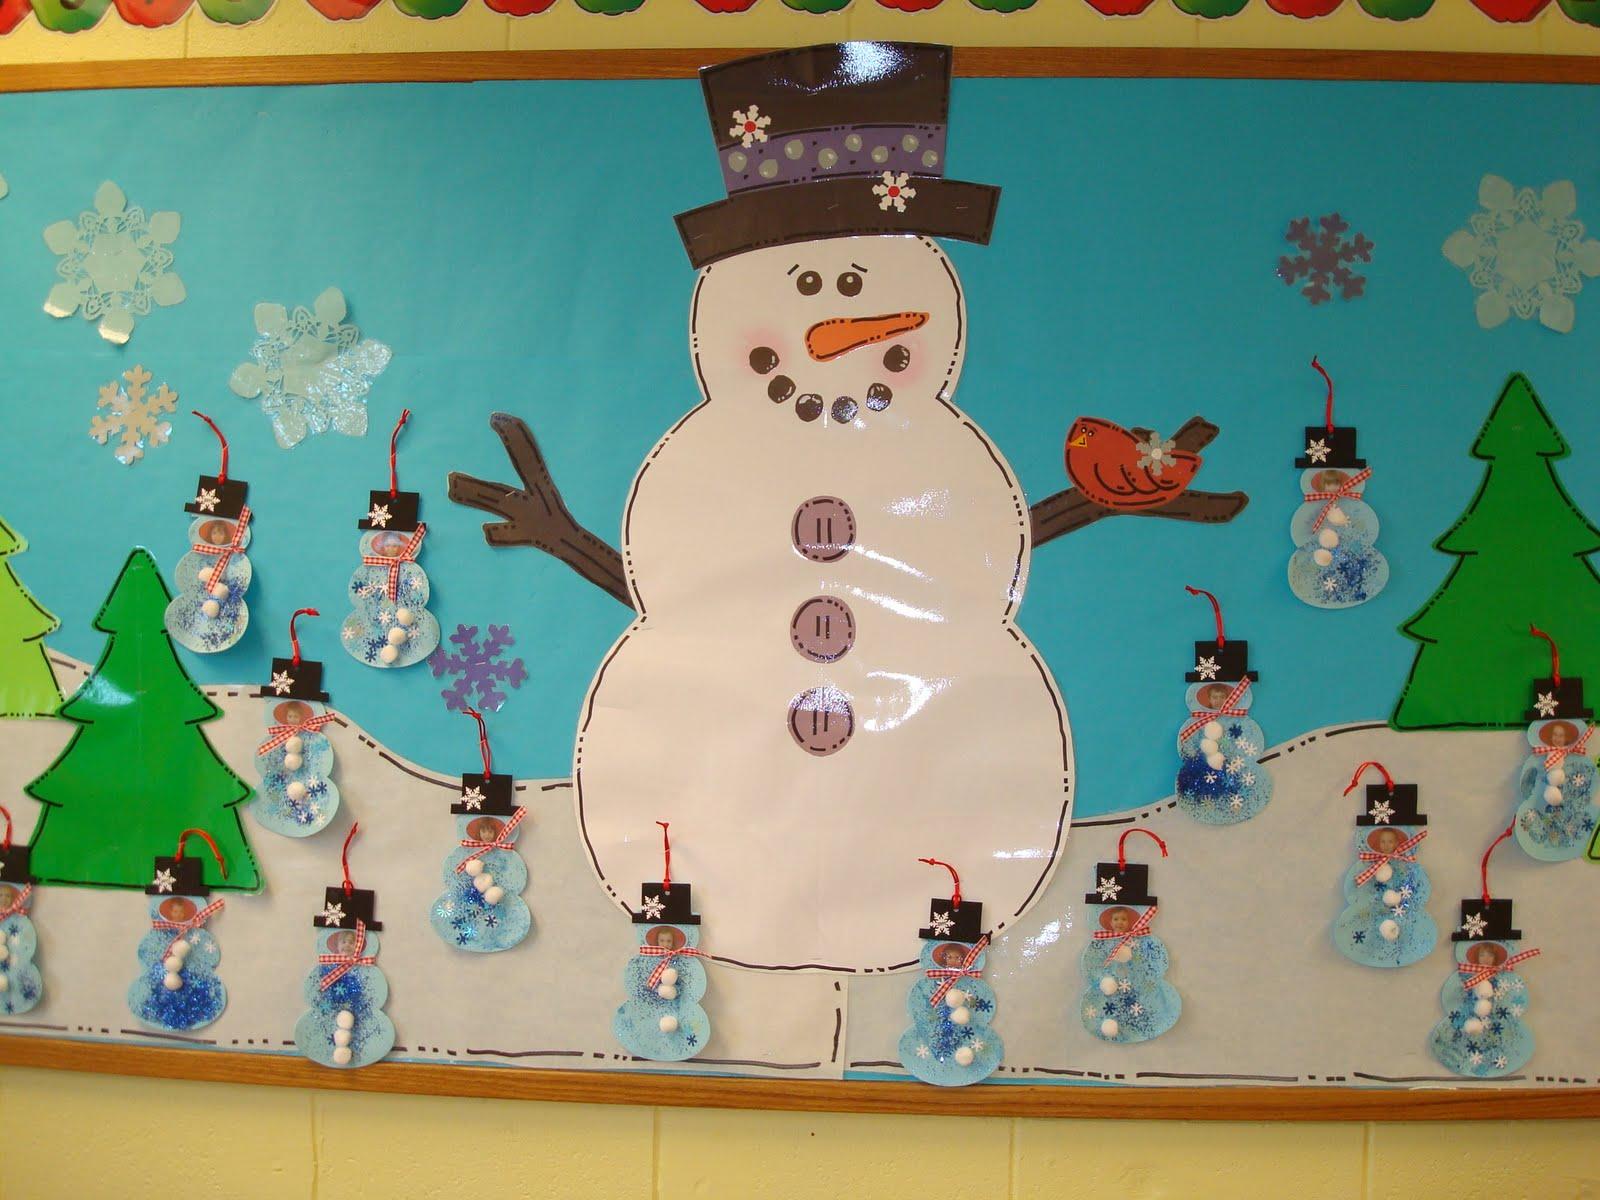 Trinity Preschool Mount Prospect: Snowman and Christmas ...